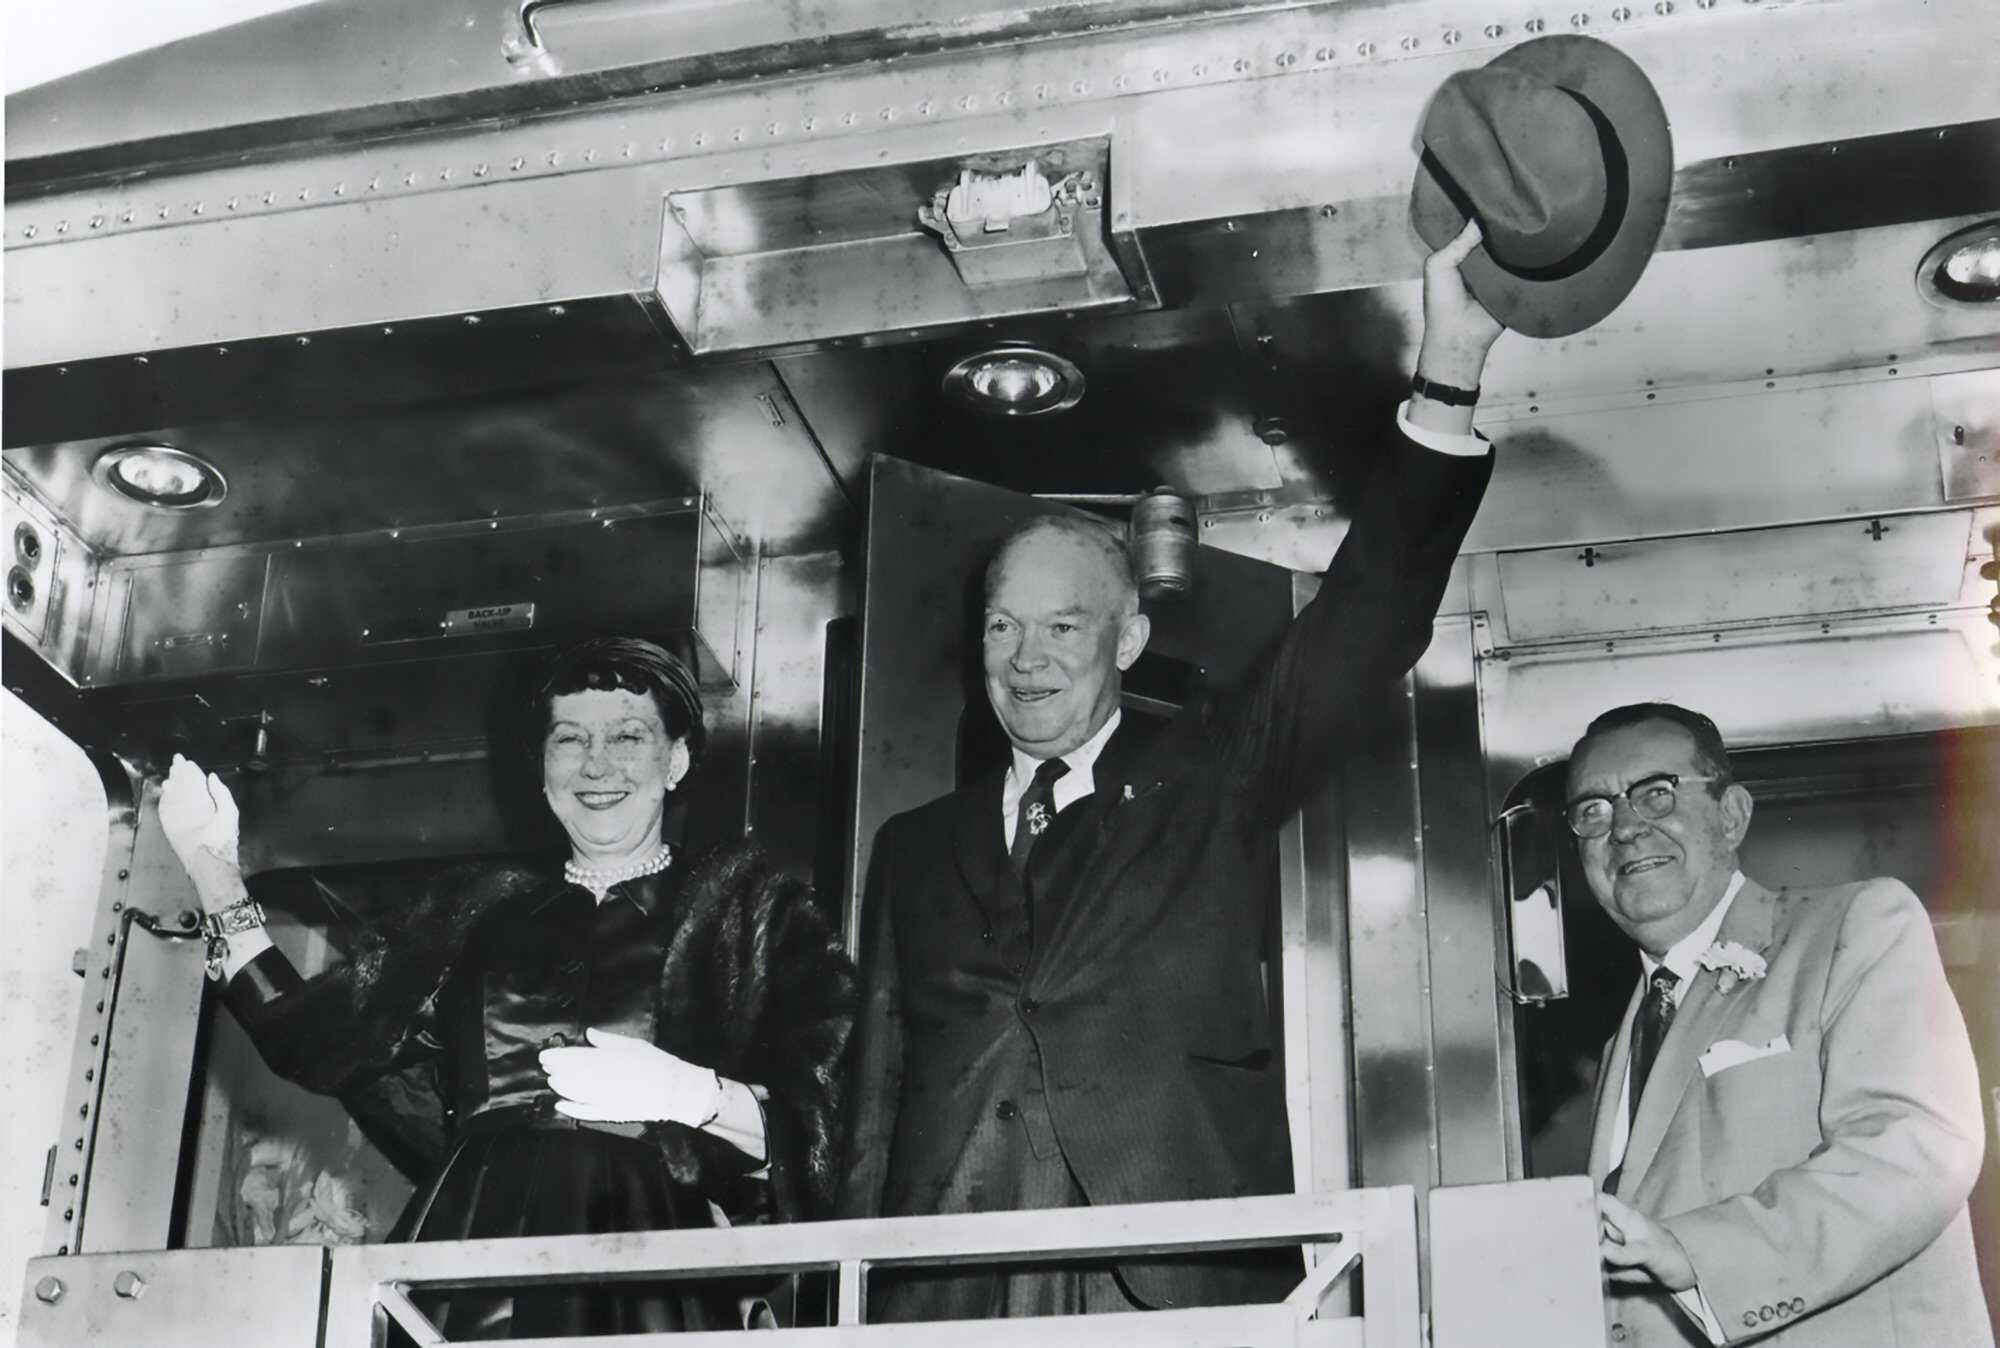 Eisenhower_legacy_3.jpg